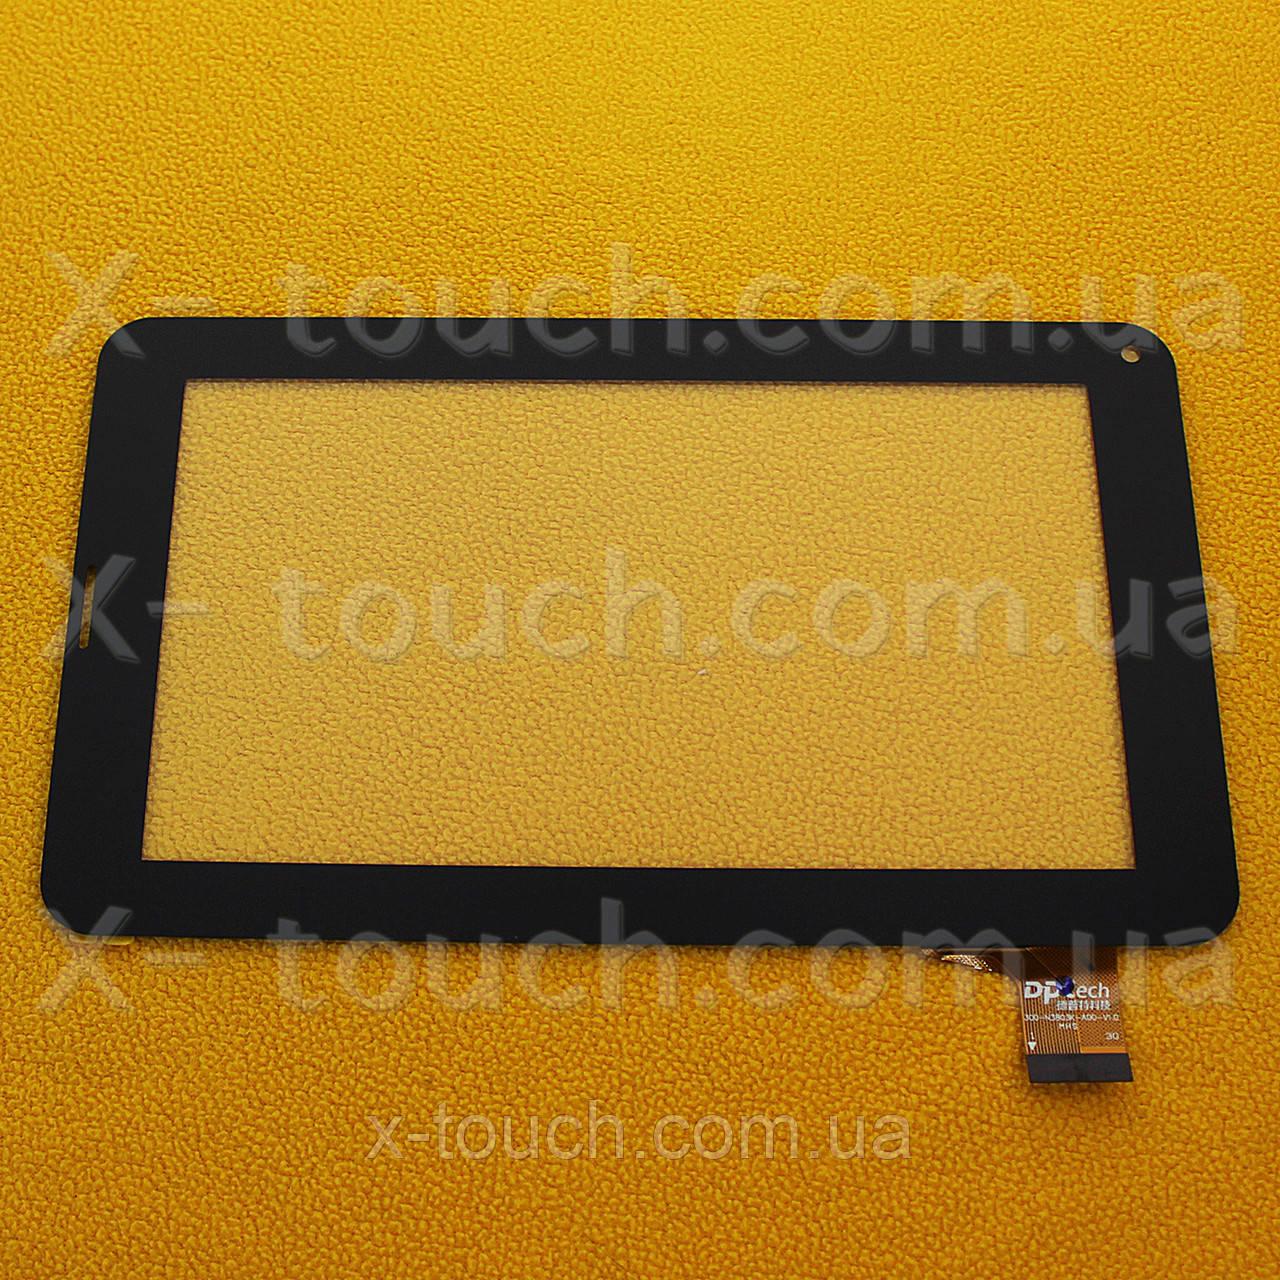 Тачскрин, сенсор  FM703906kd  для планшета